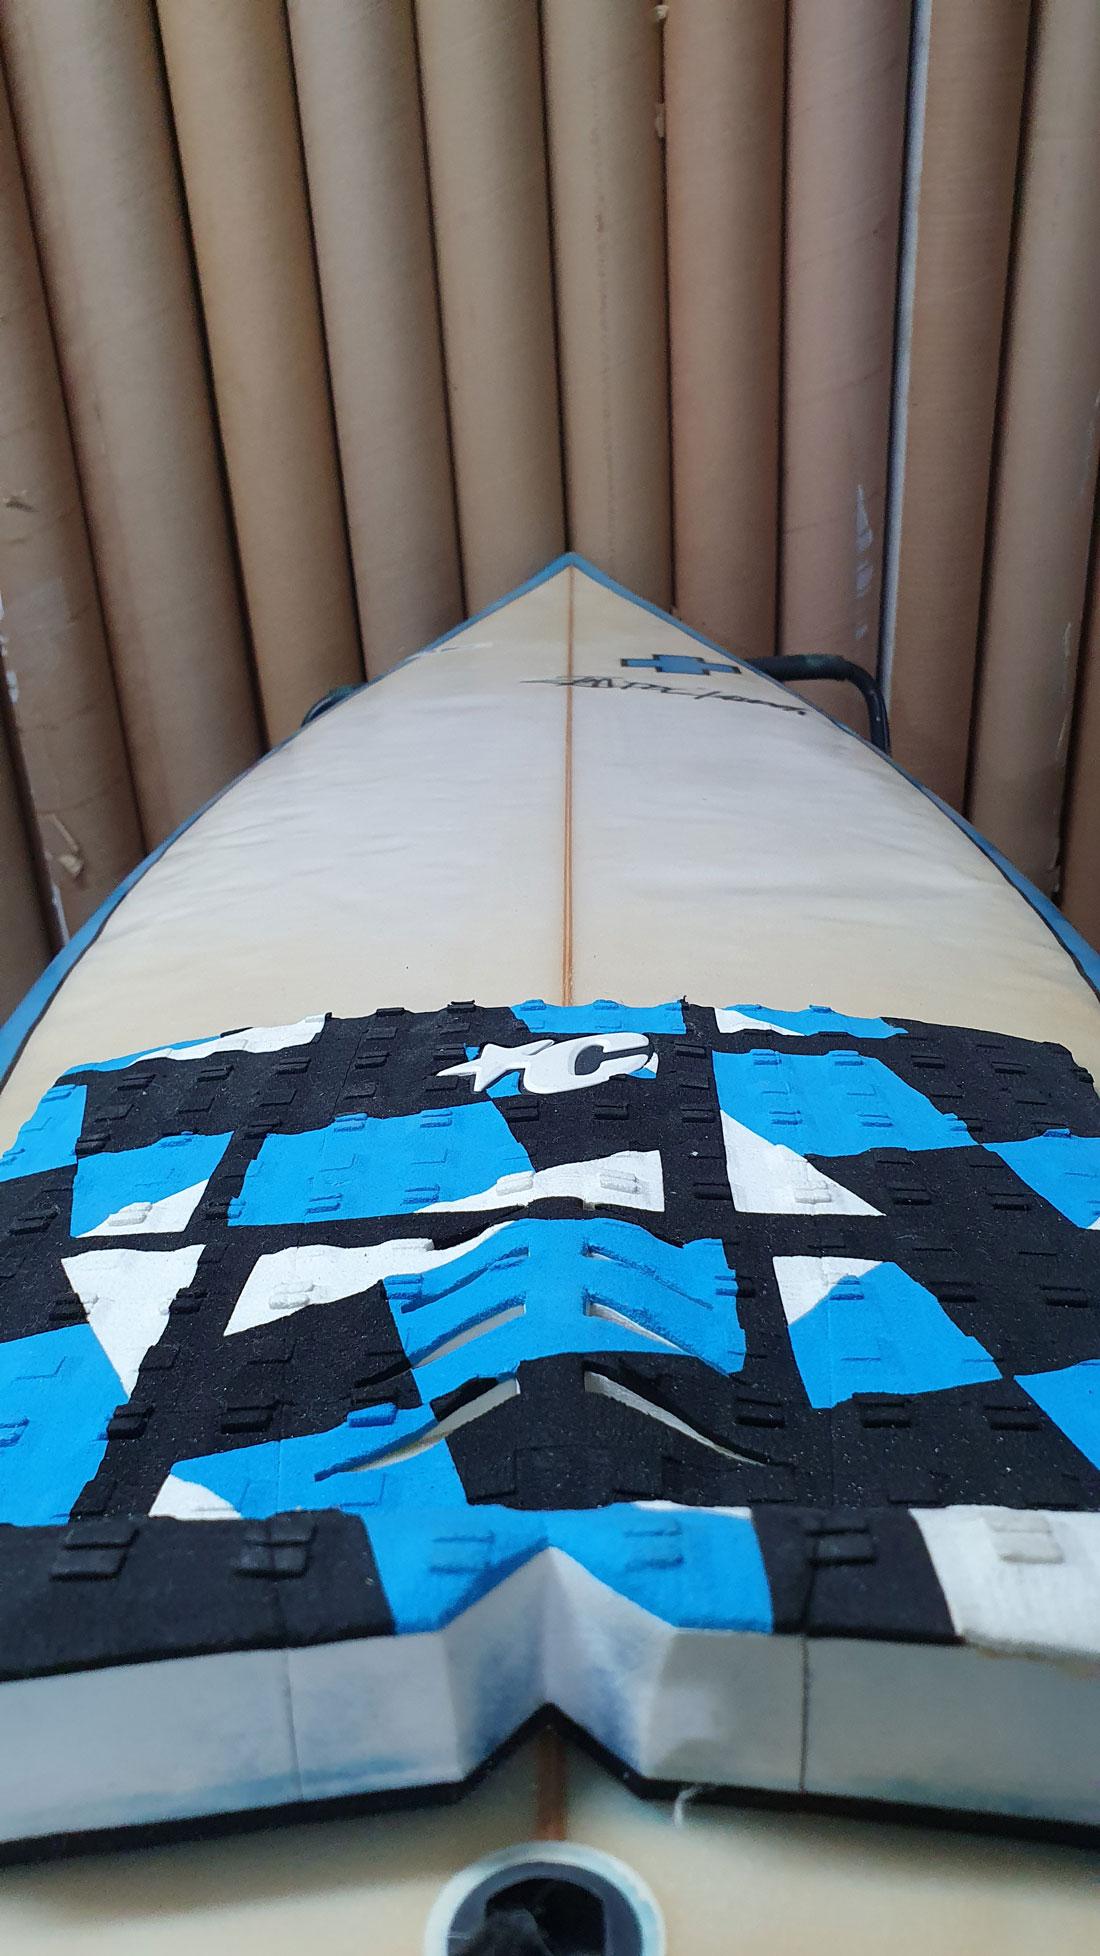 "Prancha Surf RX 5'10"" x 18,37 x 2,20"